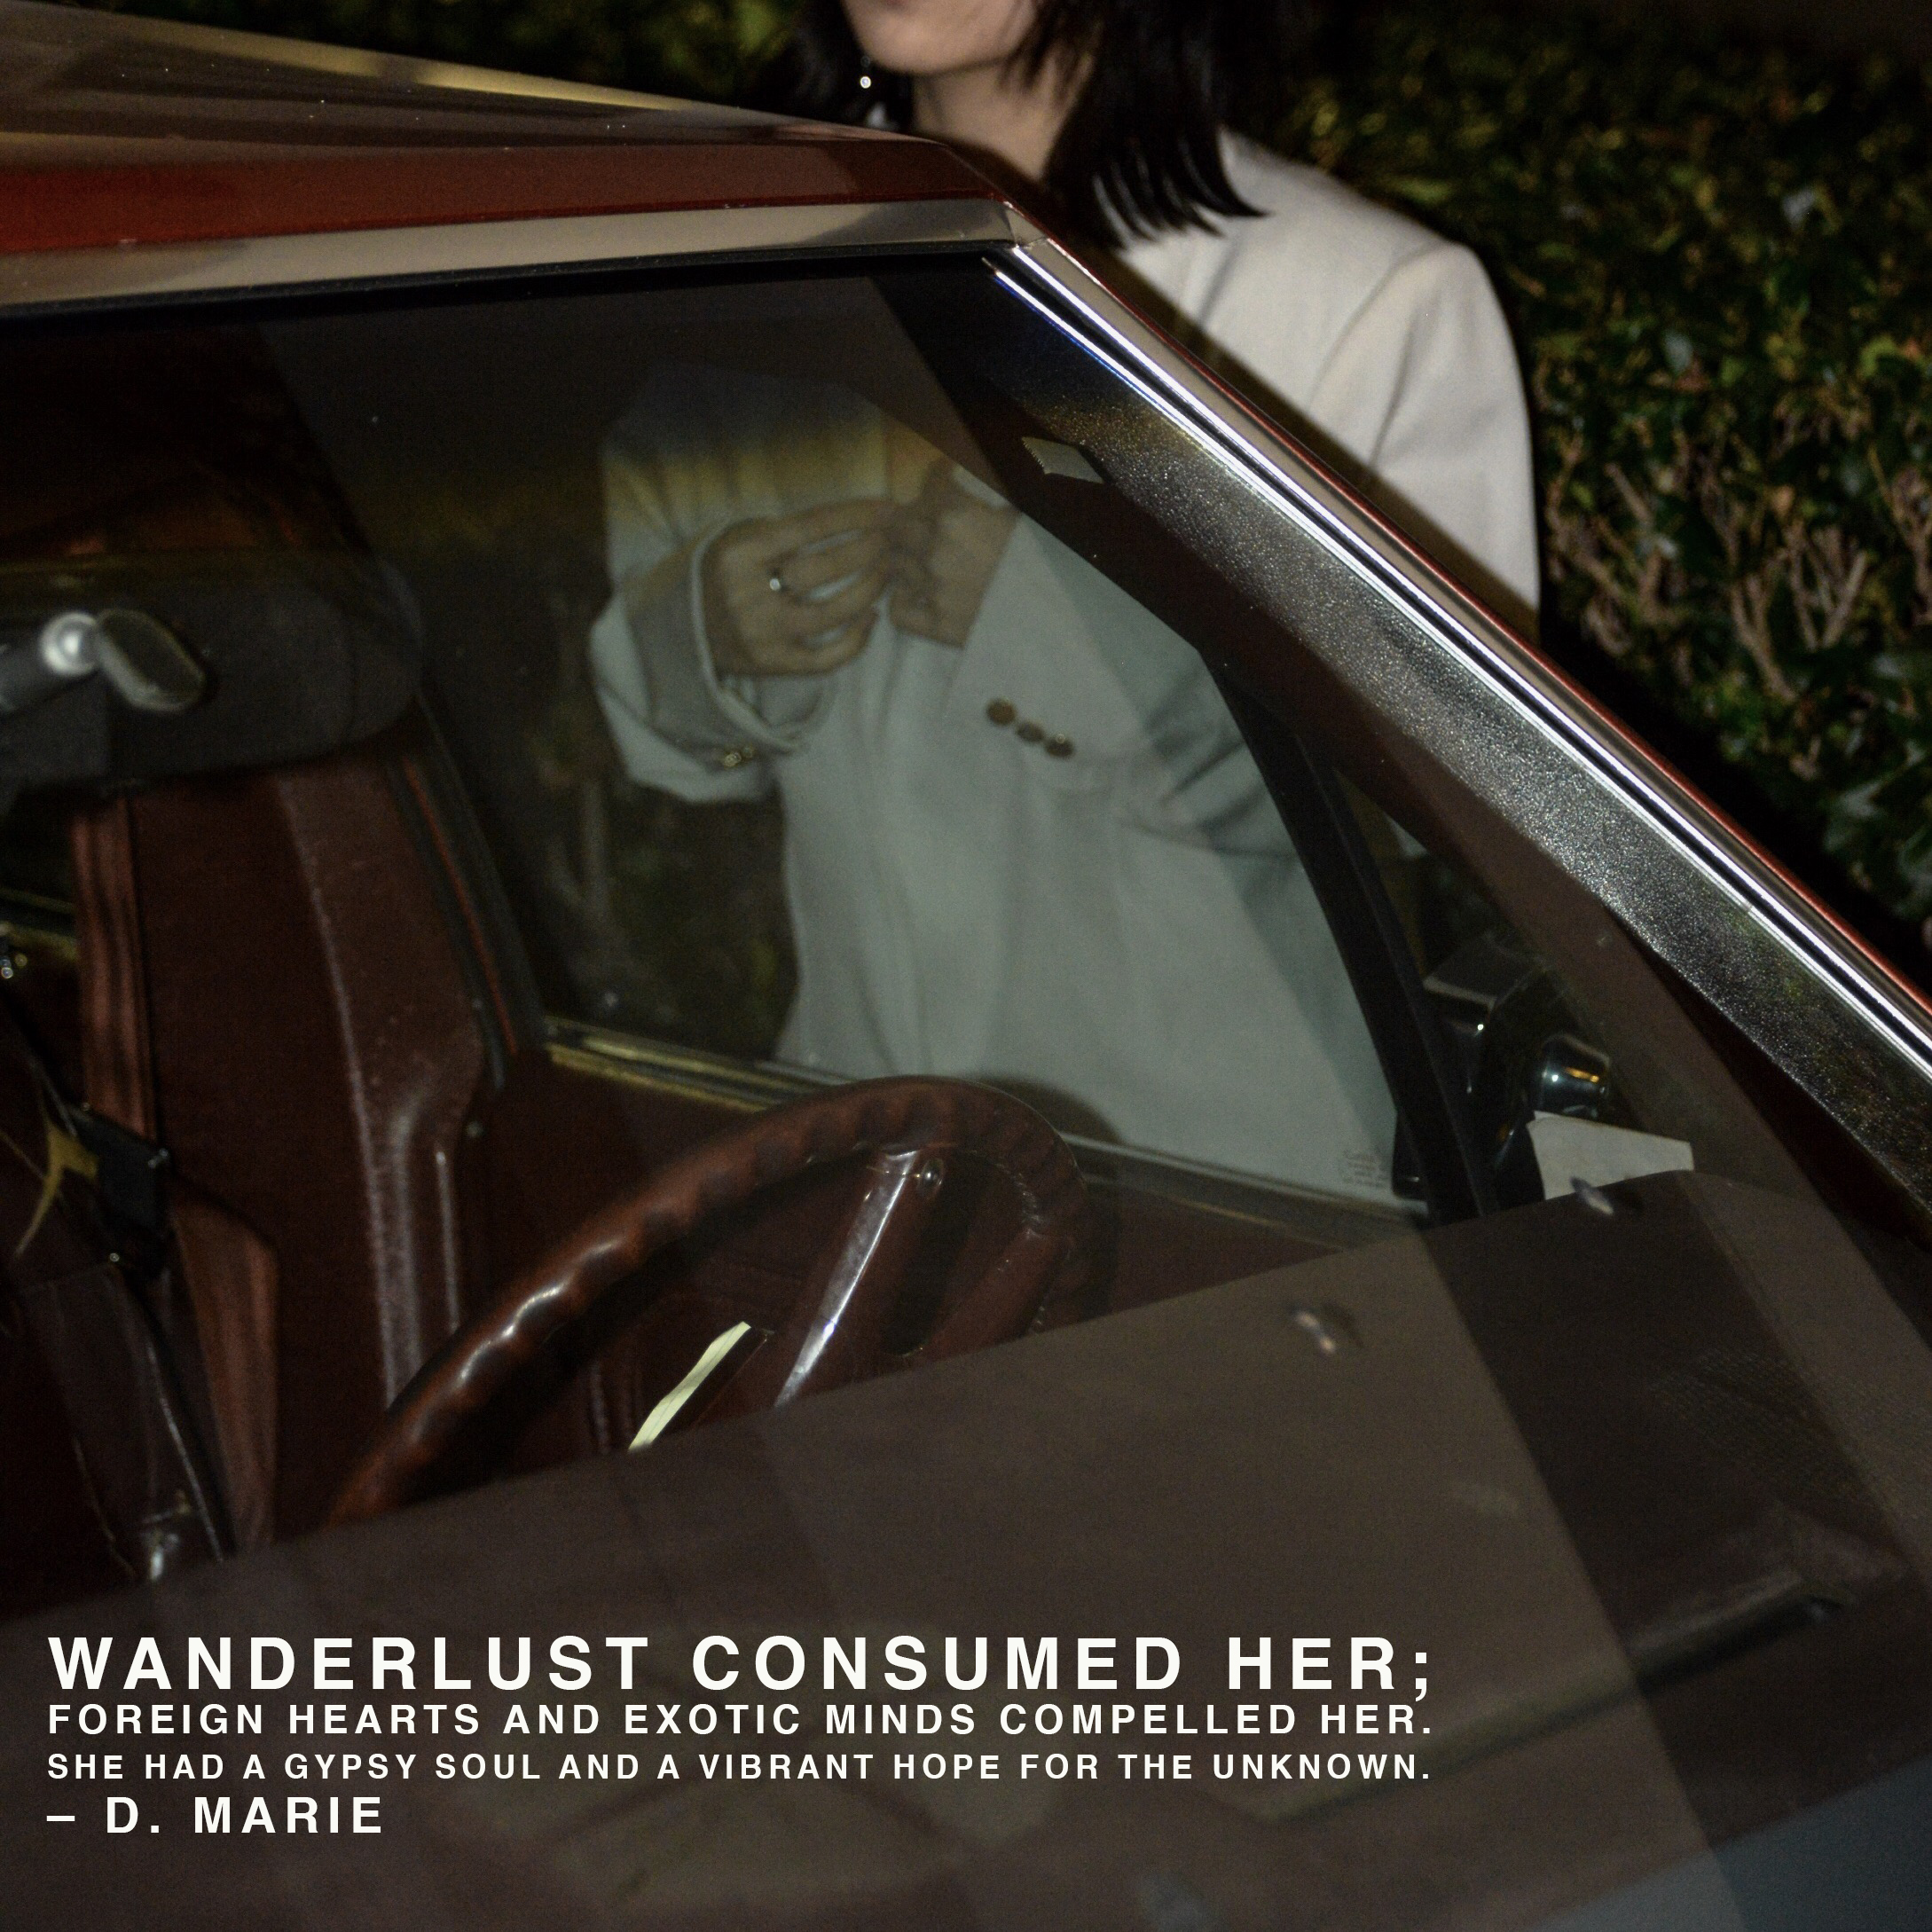 Wanderlust_2.JPG